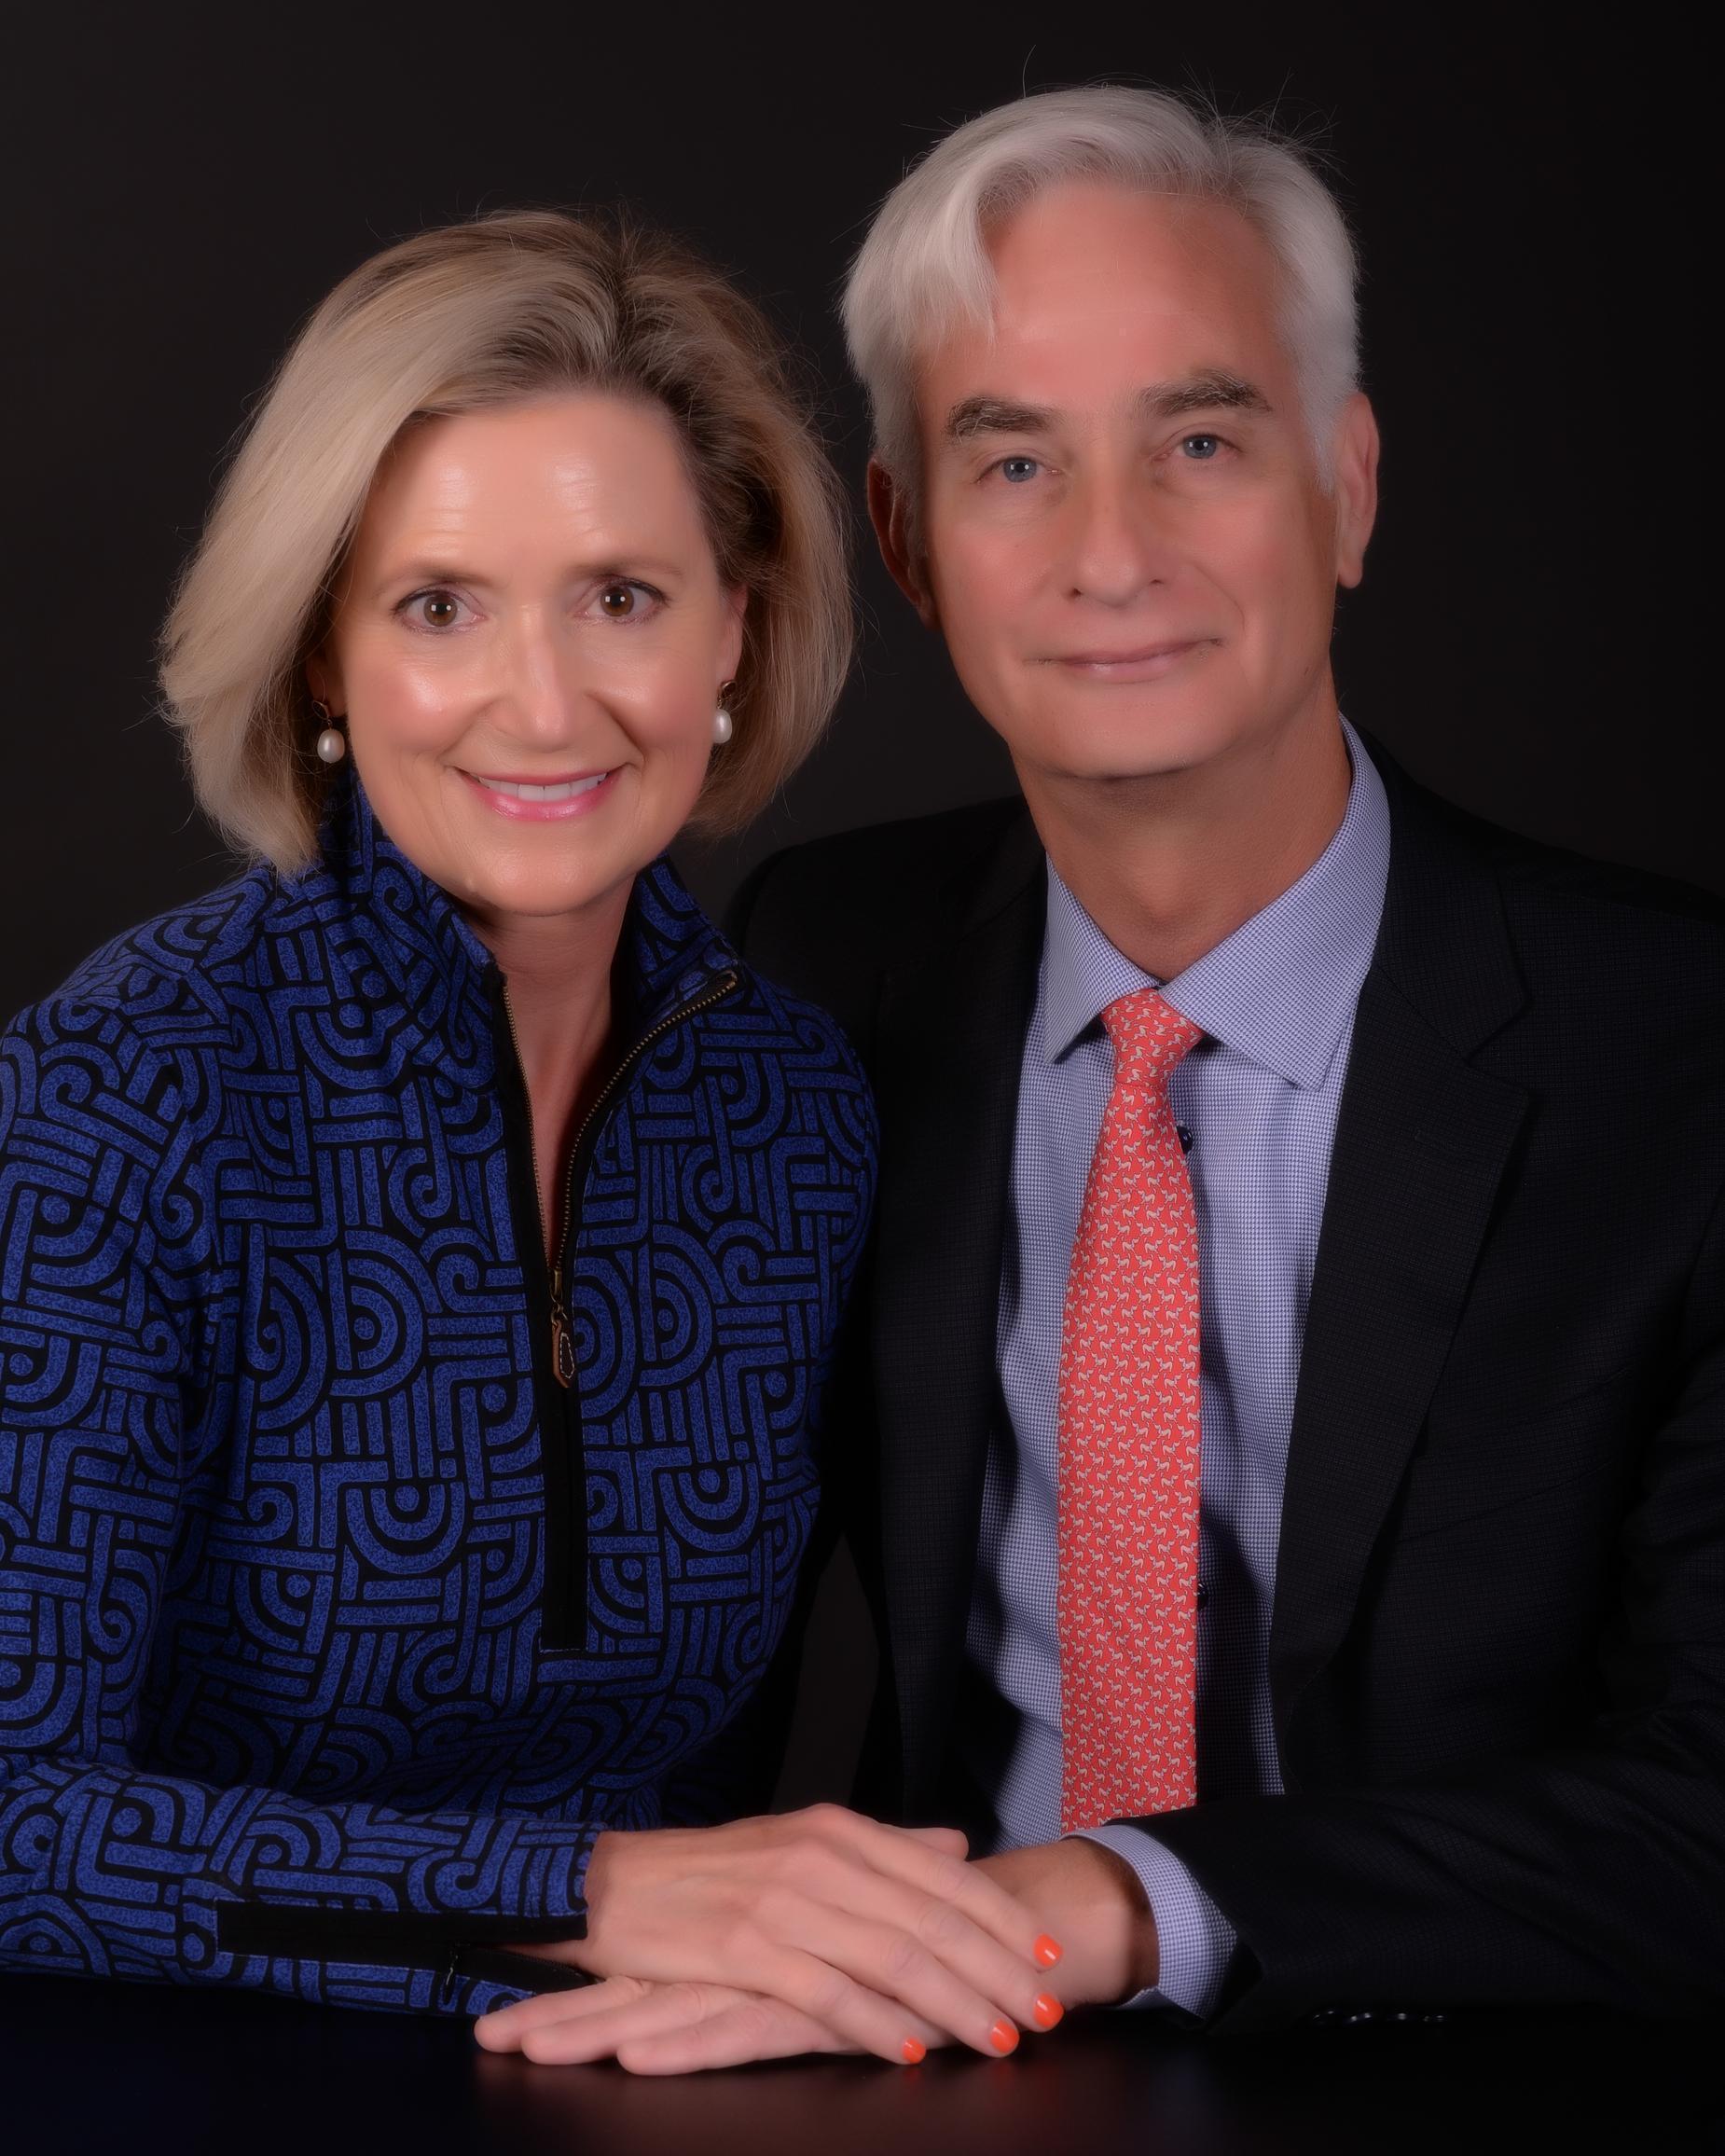 John H. and Cynthia Lee Smet